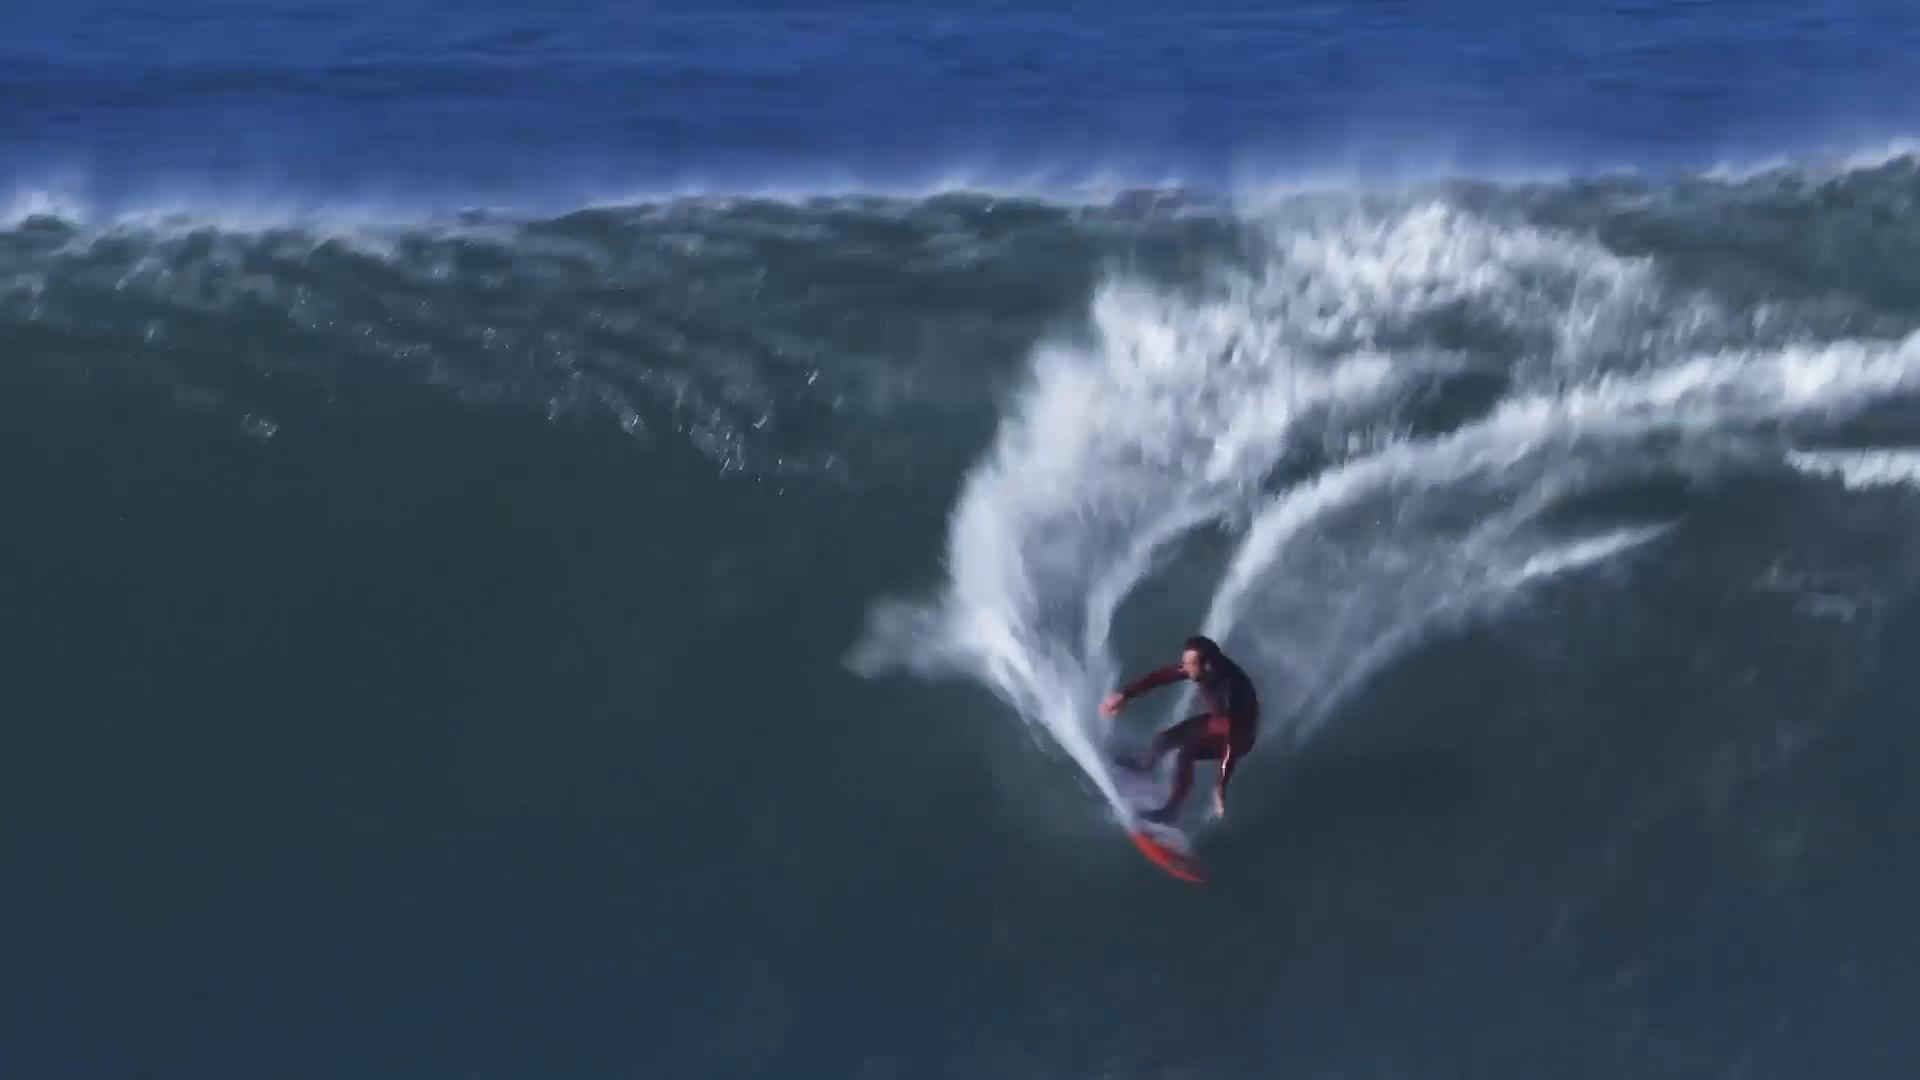 Big Wave in the Basque Country Ingles, with Laurels. Azkena Carrascon.MP4.Imagen fija013.jpg